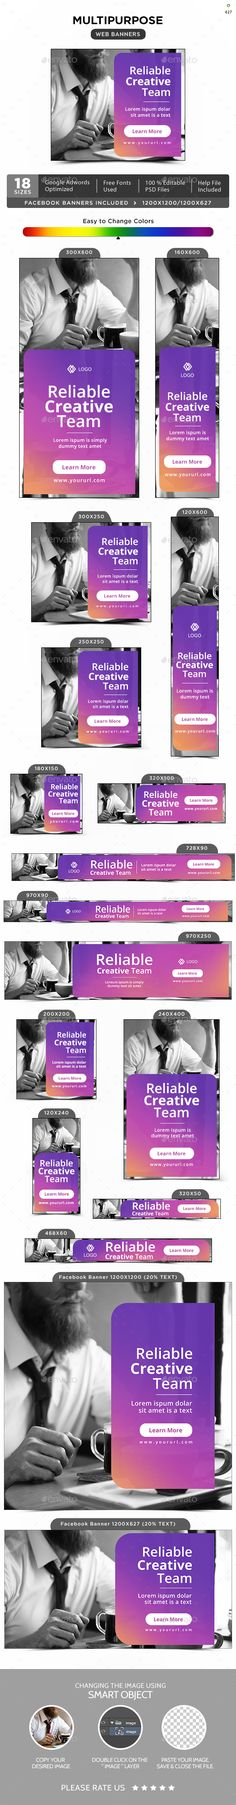 Multipurpose Banners Template PSD #design #web #ad